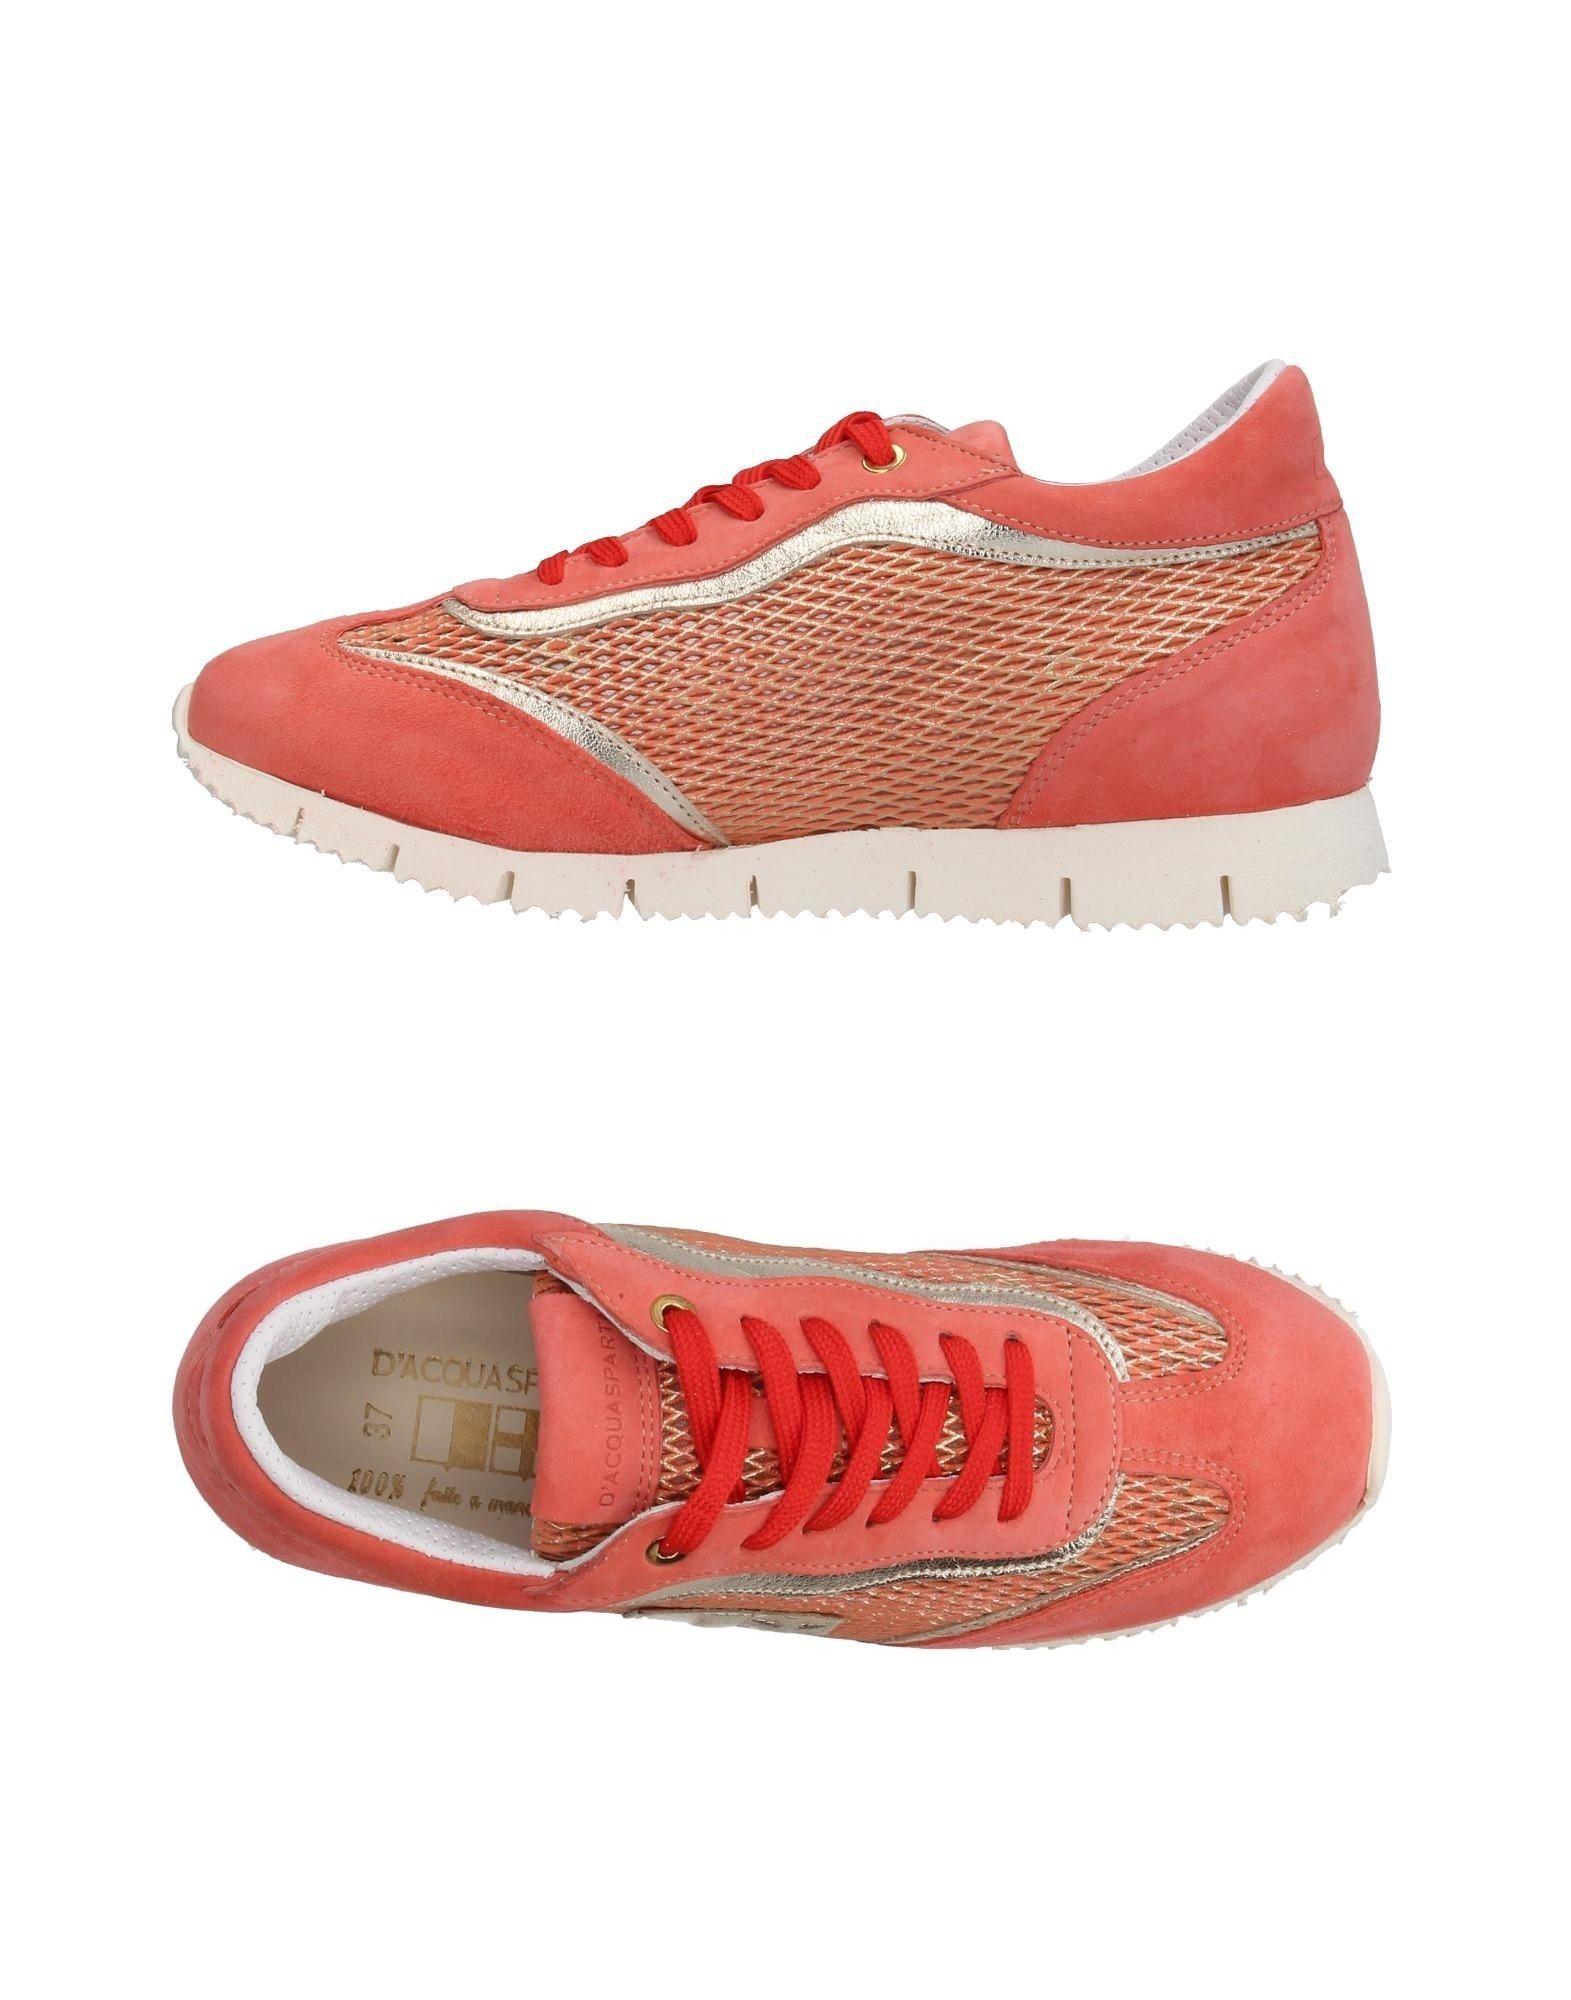 D'Acquasparta Sneakers Damen  11233037GW Gute Qualität beliebte Schuhe